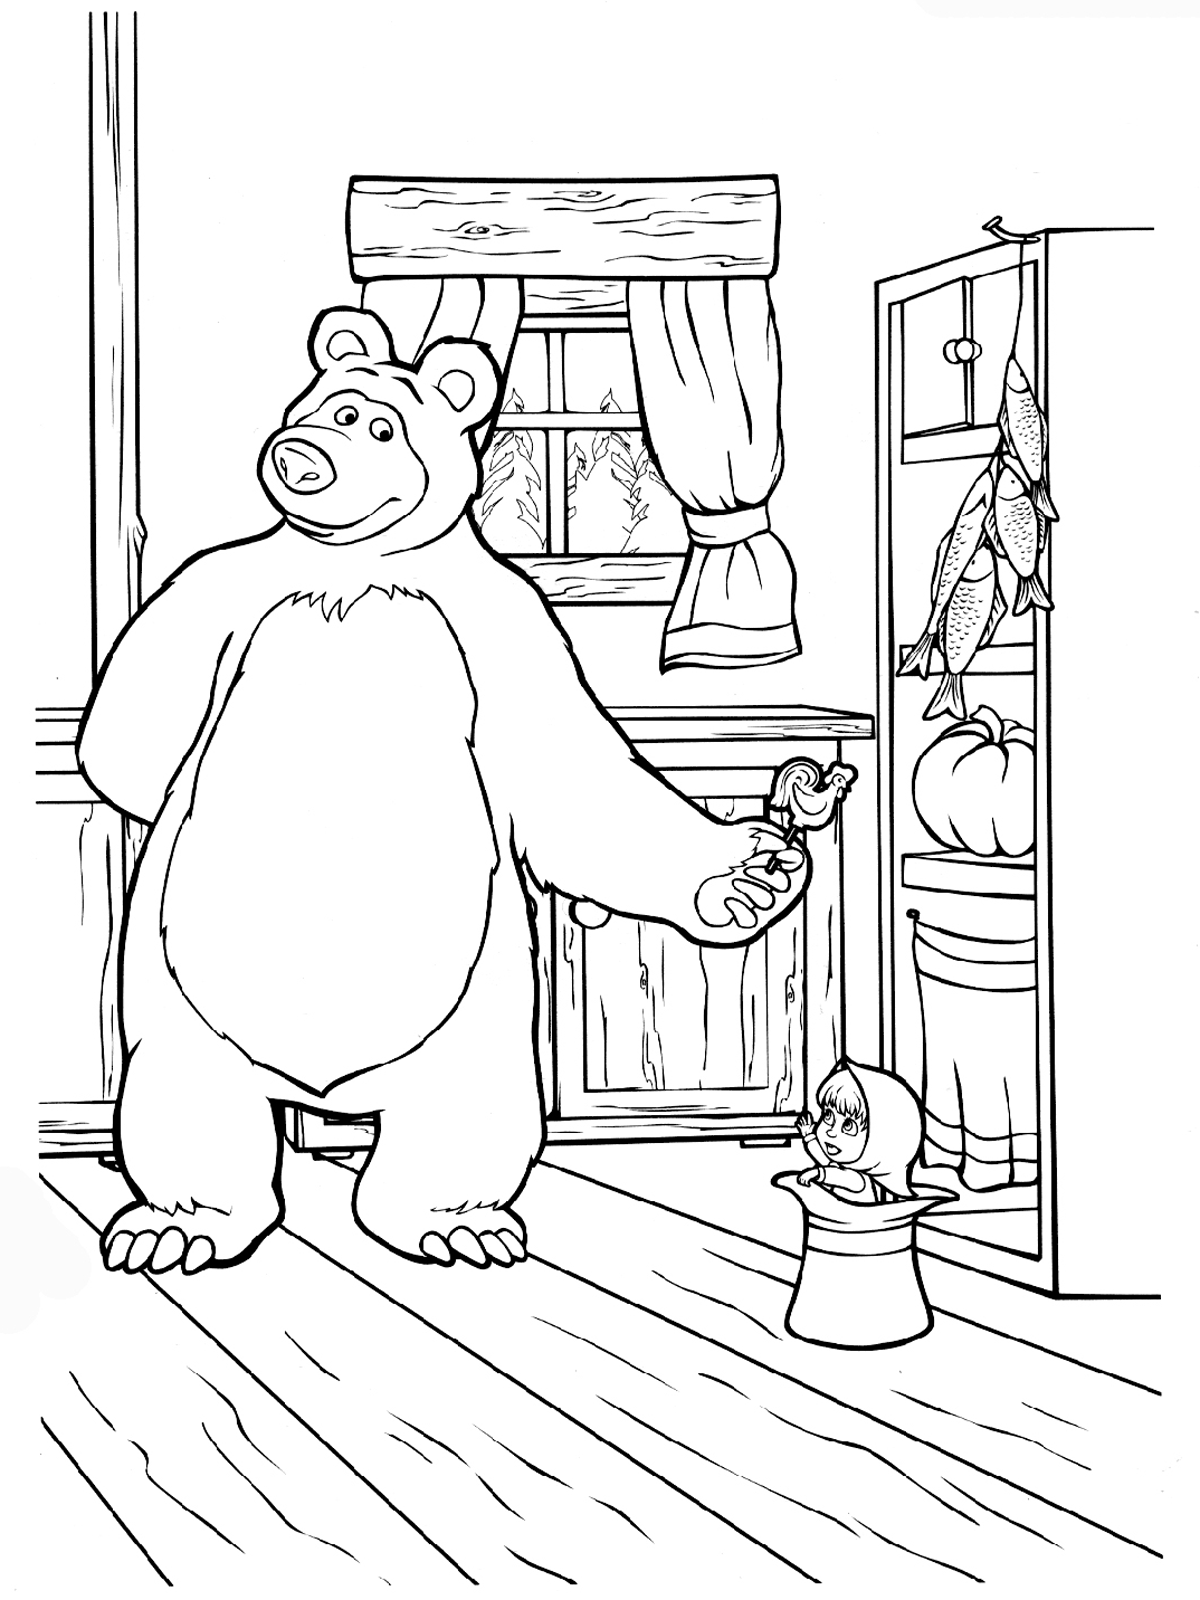 Masha and the bear russian printables ile ilgili görsel sonucu